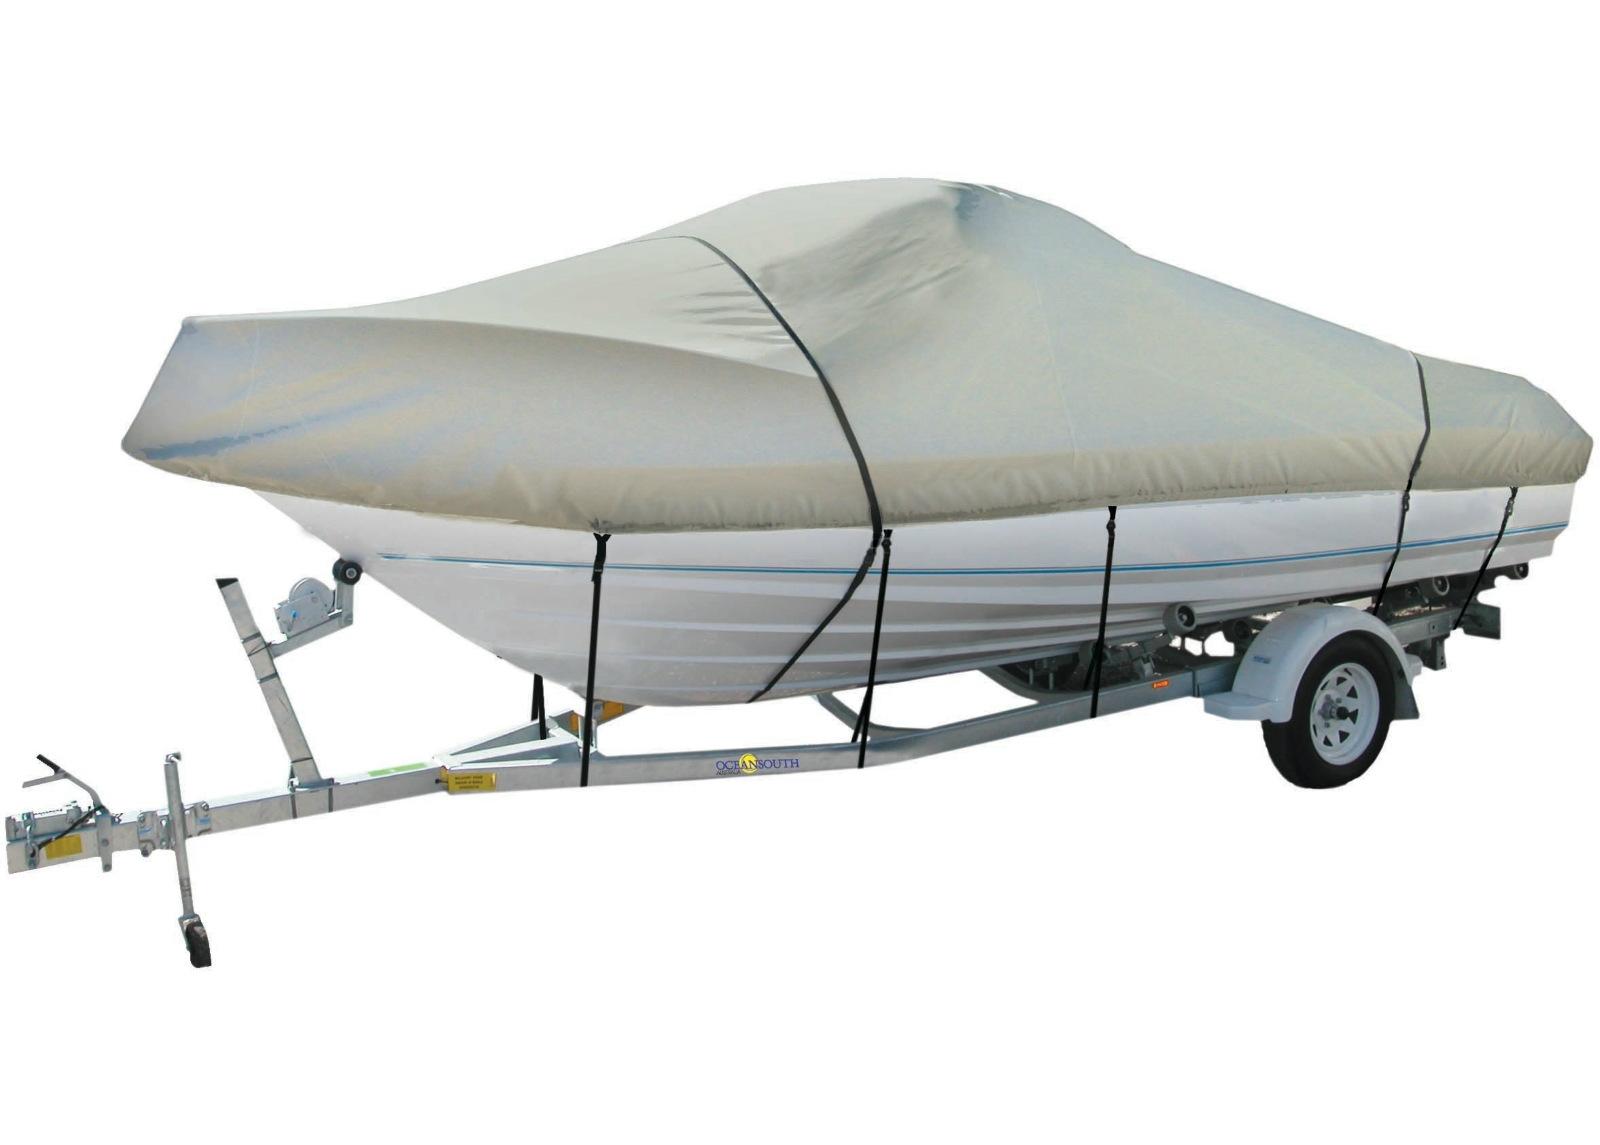 Venepeite Cabin Cruiser tyyppisille veneille 5.0-5.3 m